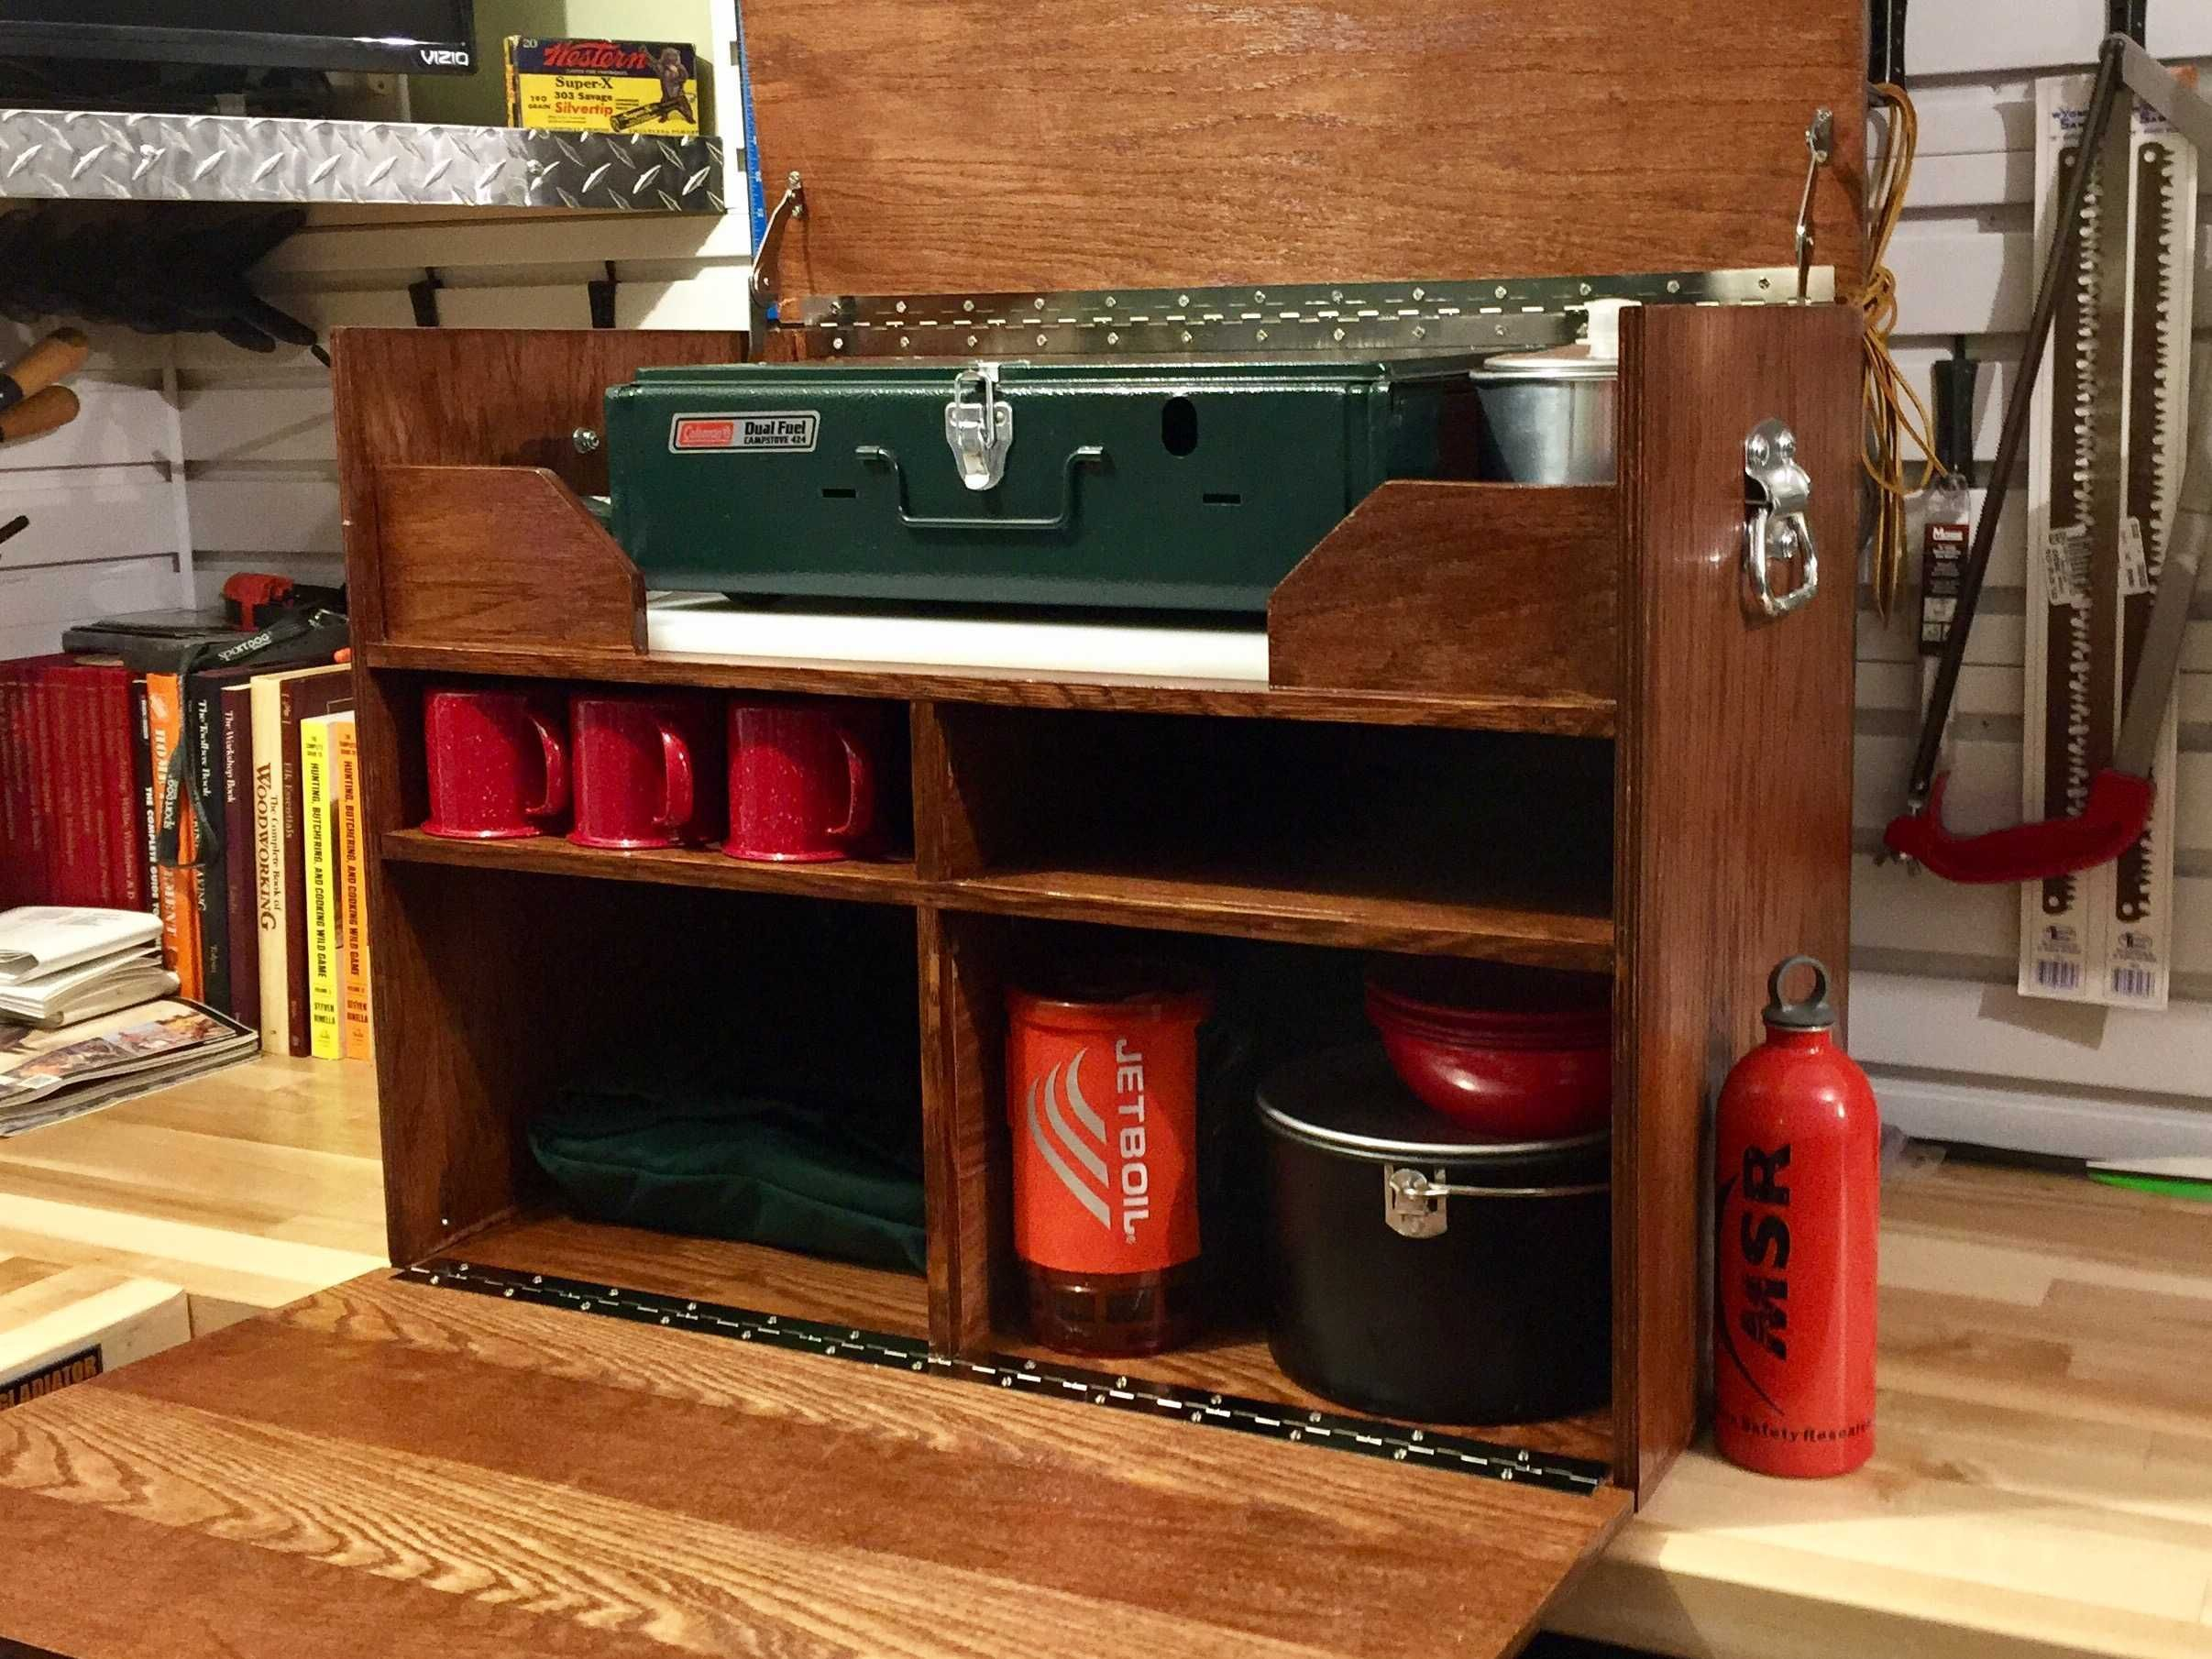 Brilliant Motorhome Organization And Storage Ideas 7 Home